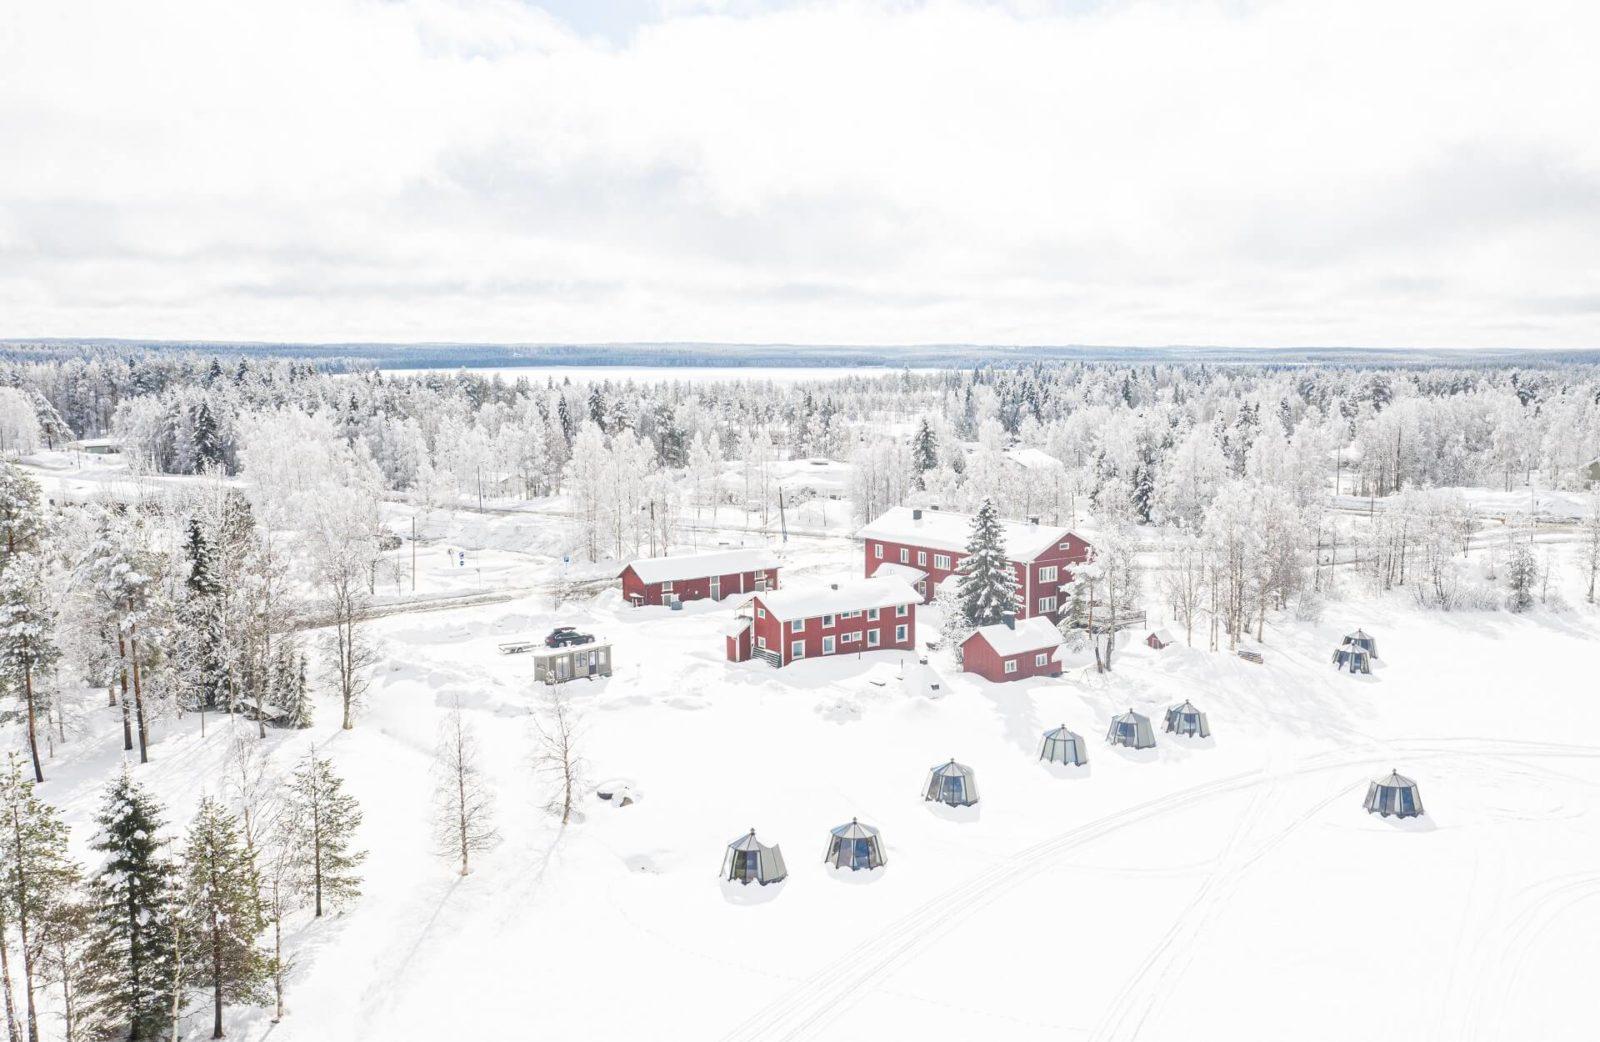 Arctic Guesthouse & Igloos - 10 AuroraHut lasi-iglua ja Gasthaus Ranua kuvattuna talvella 2020